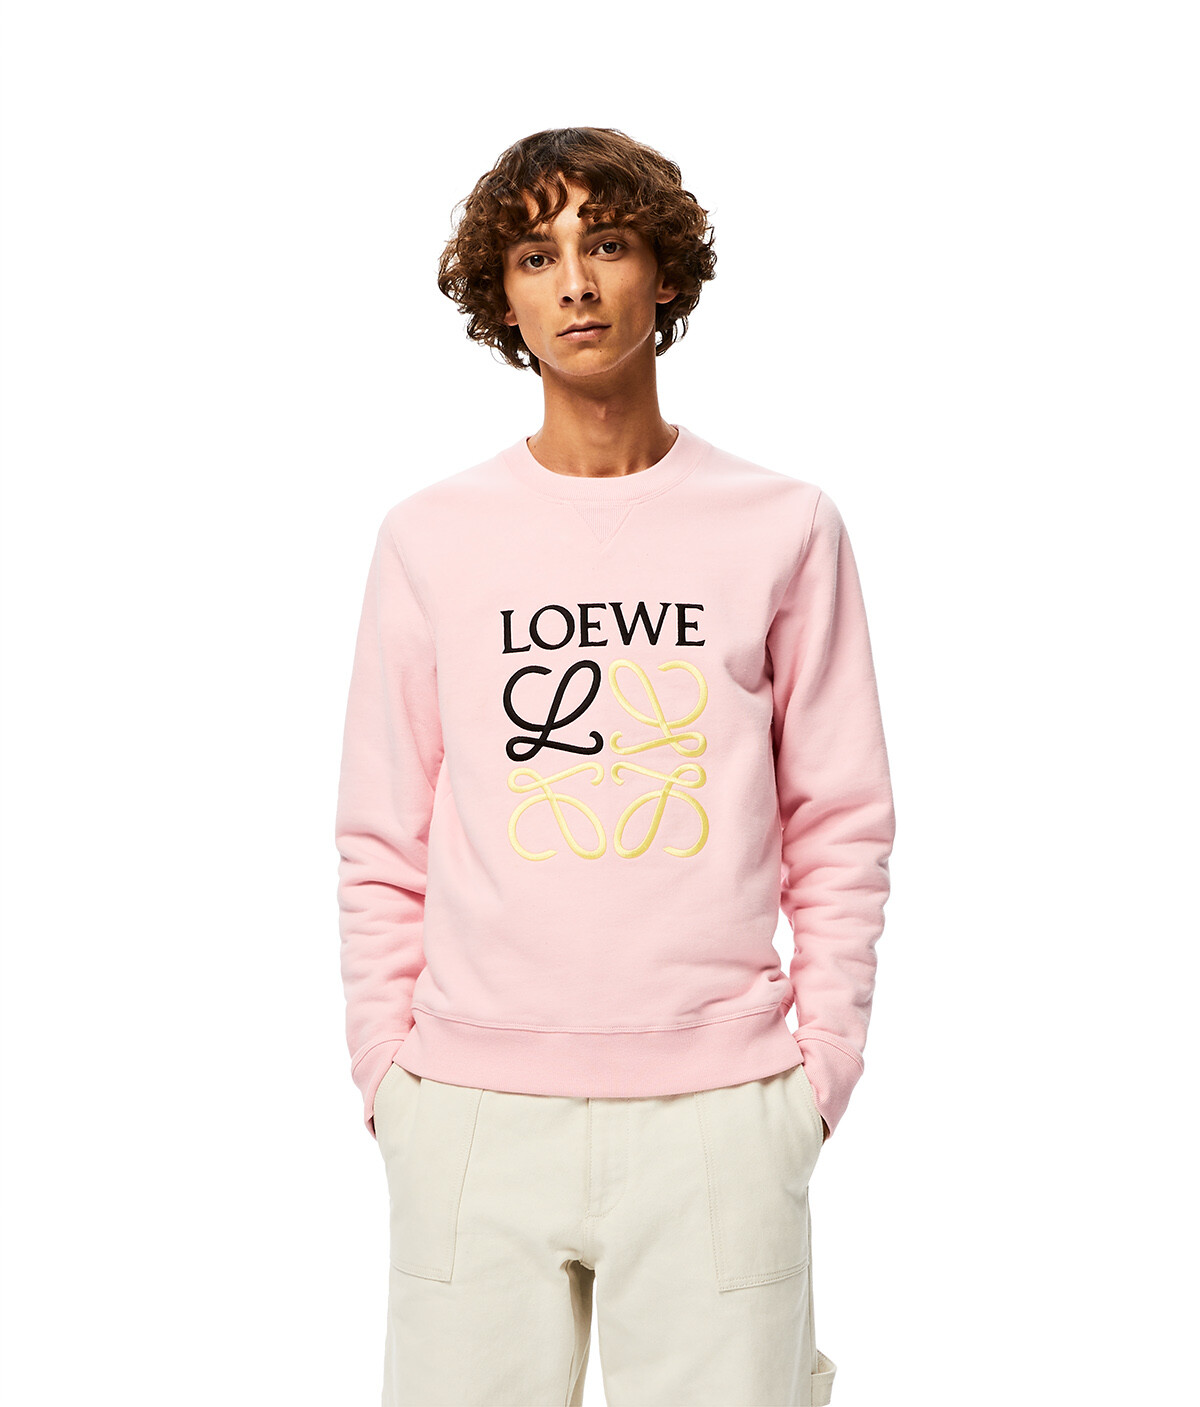 LOEWE Anagram Sweatshirt Baby Pink front